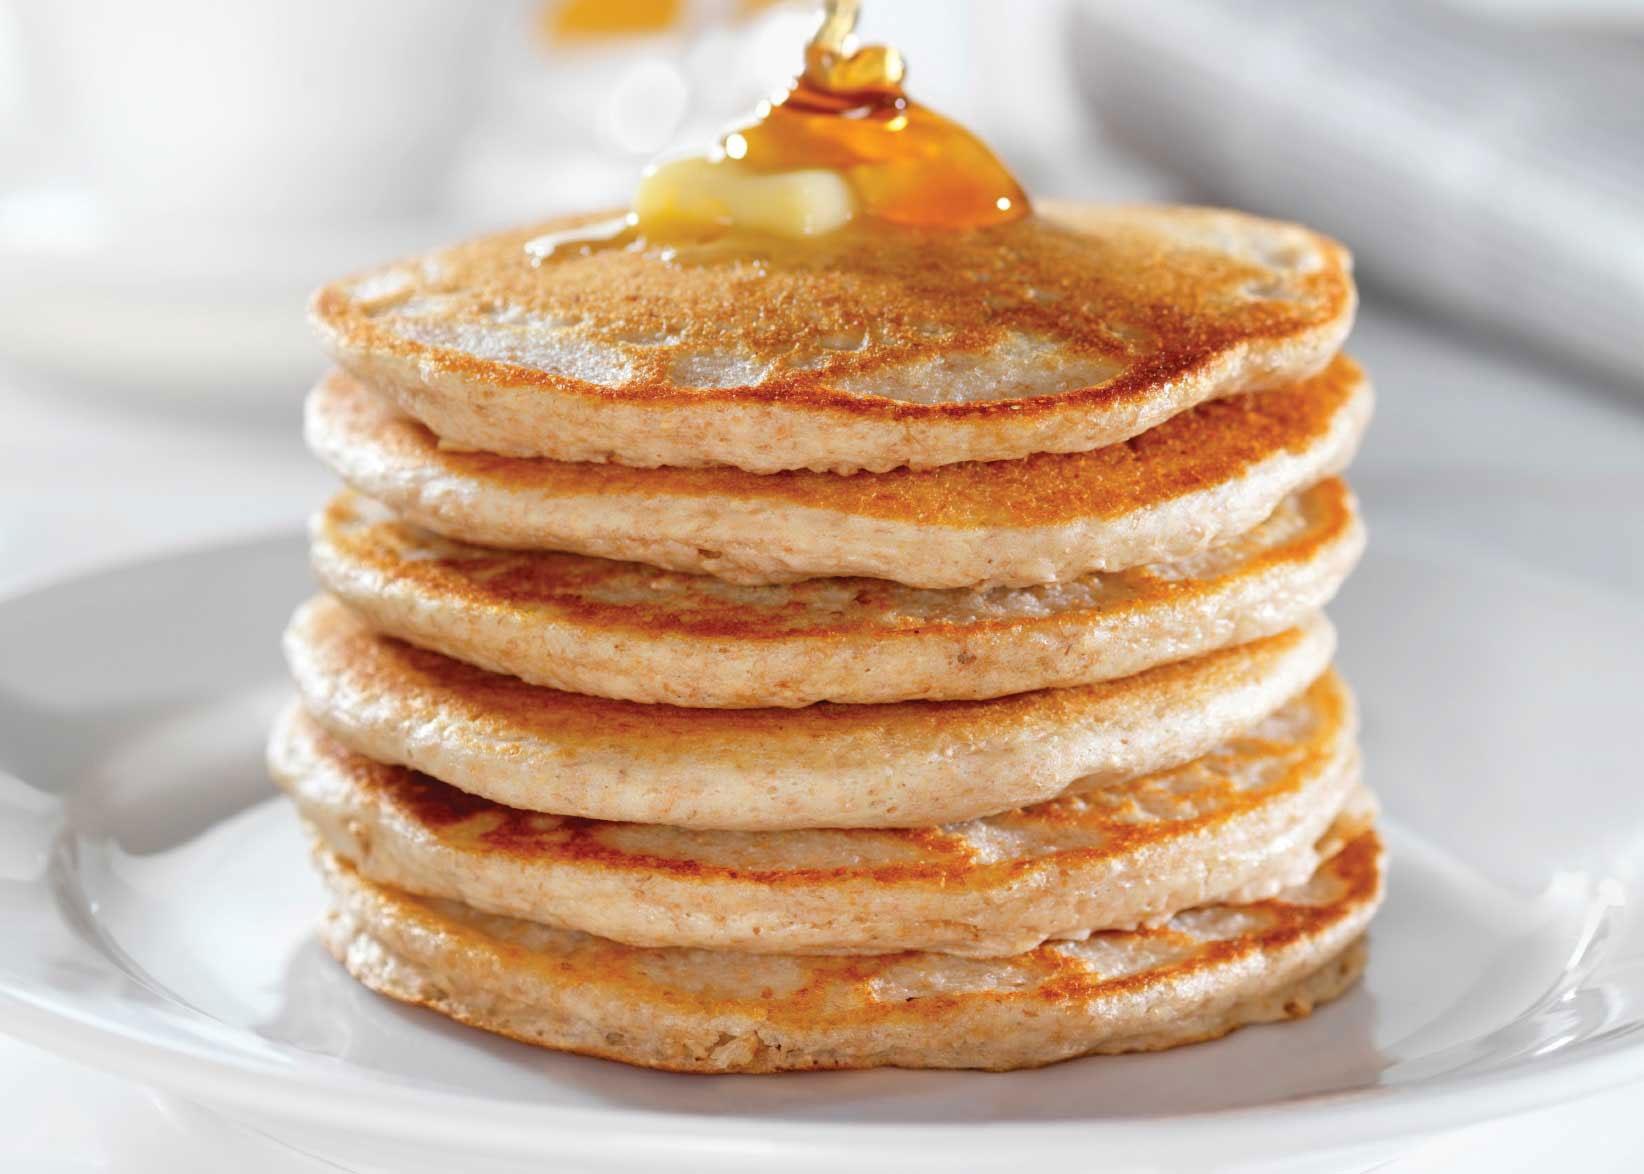 Online Personal Trainer Breakfast Recipes - Banana Breakfast Pancakes.jpg